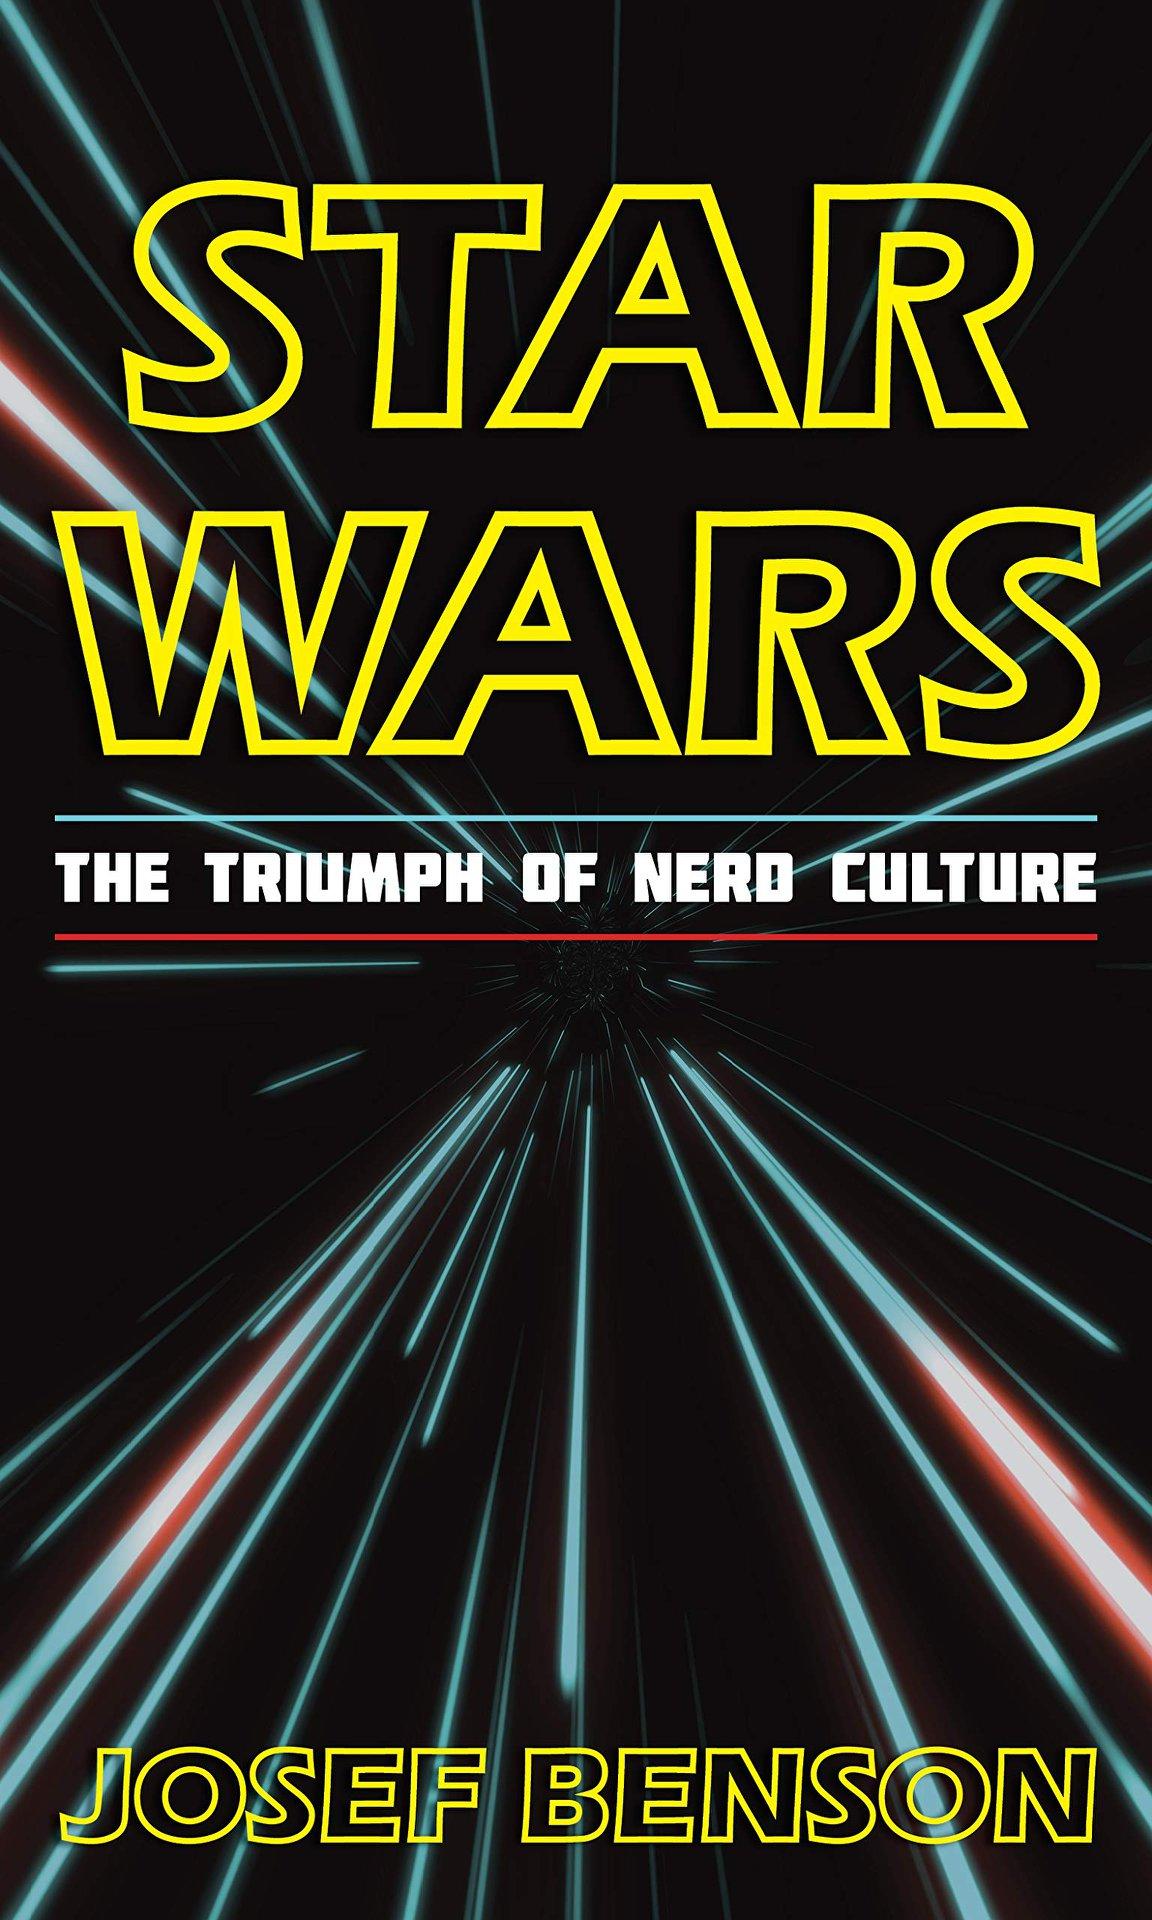 Star Wars: The Triumph of Nerd Culture